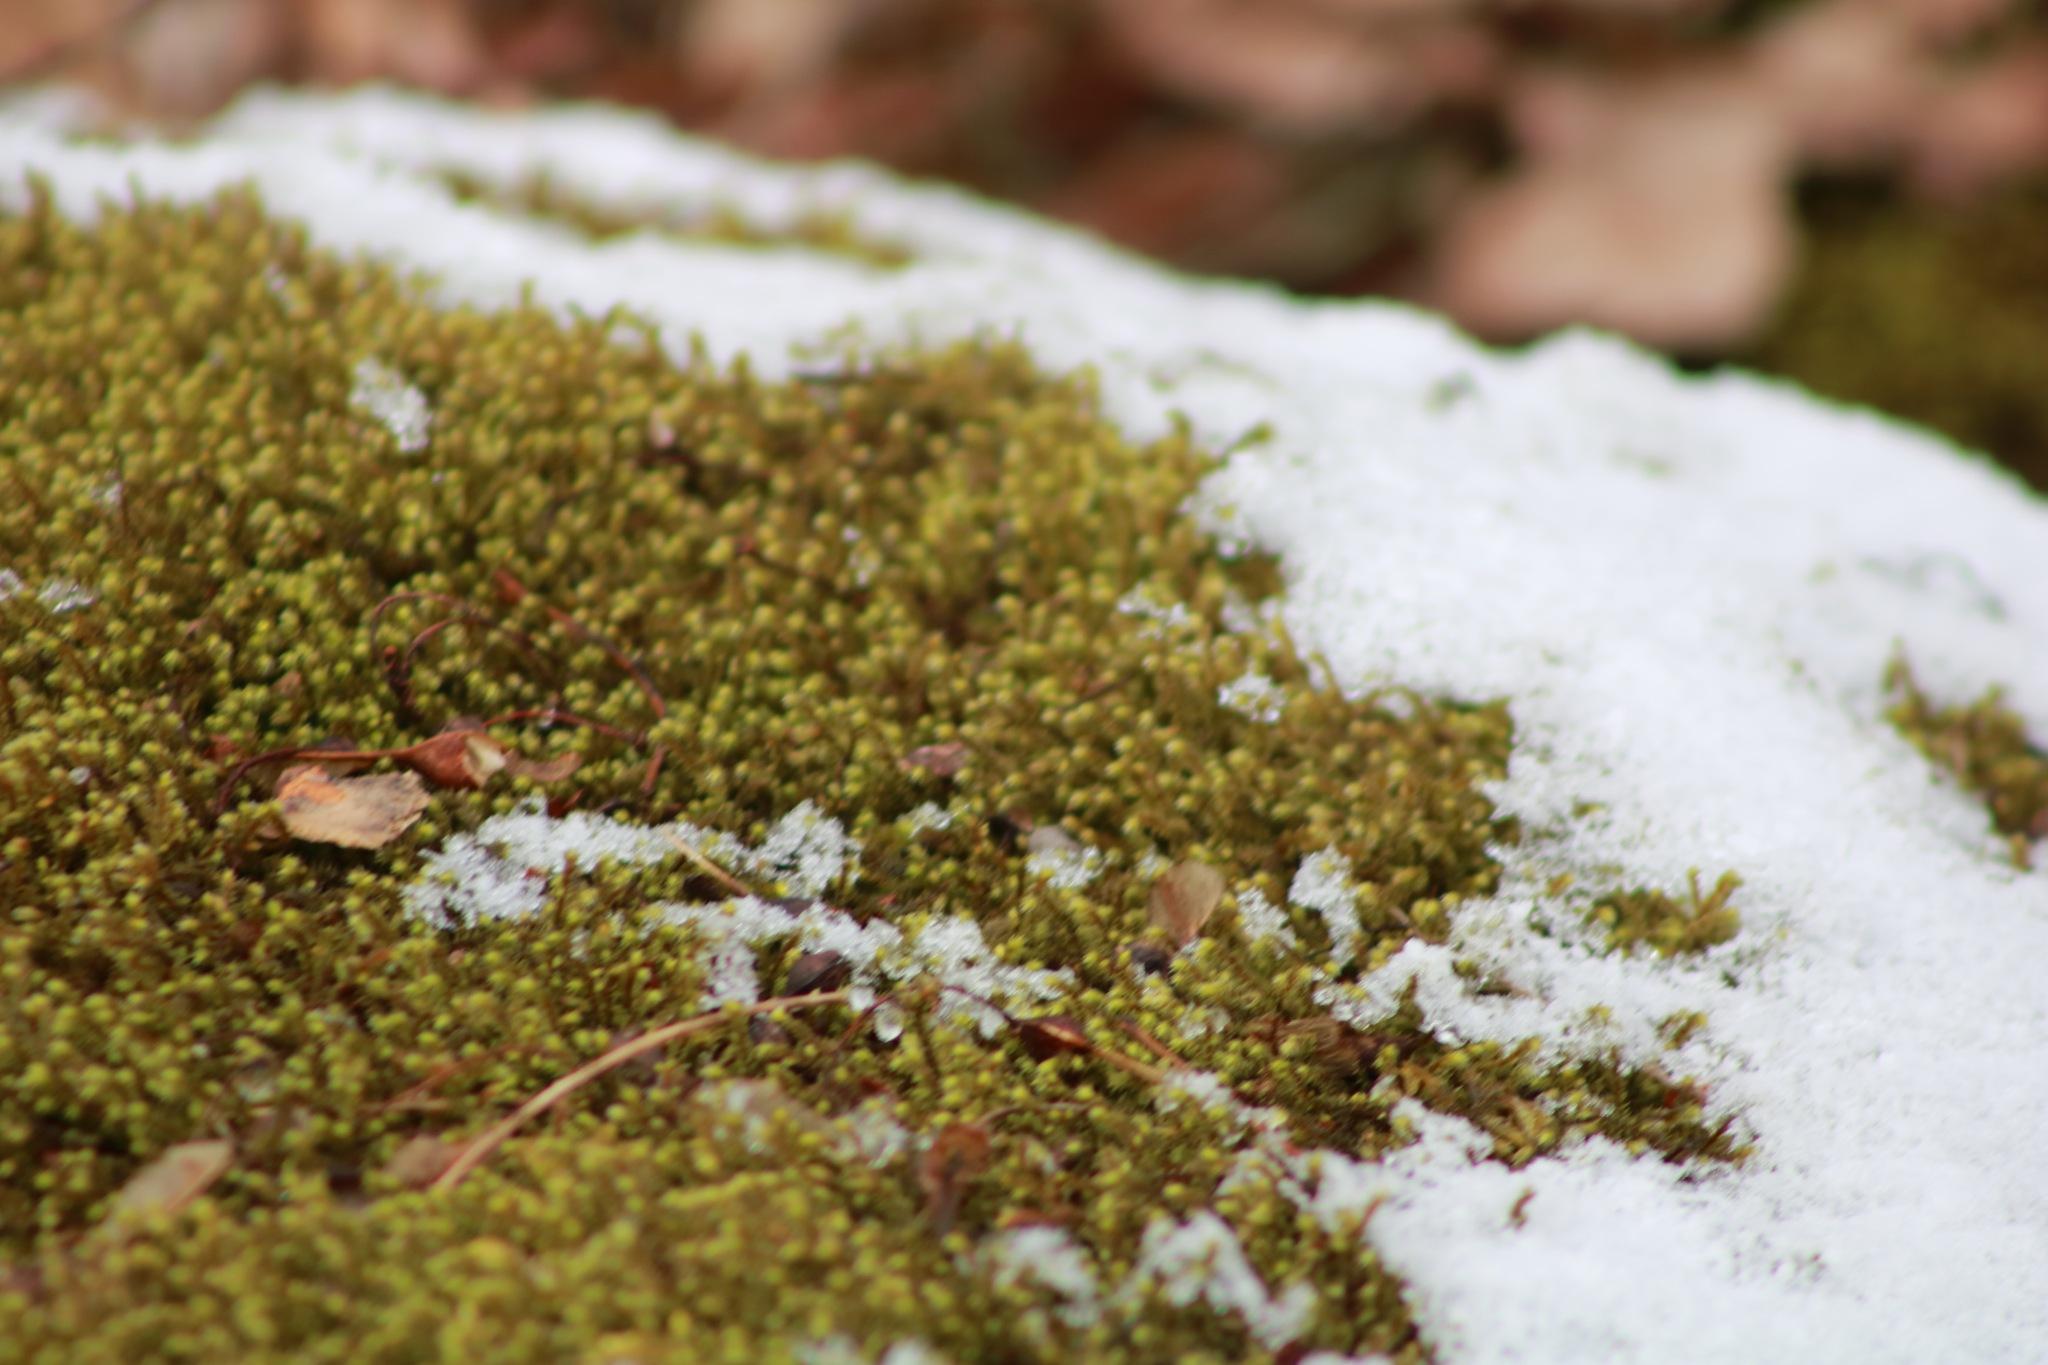 moss 'n snow by Peter O Merz